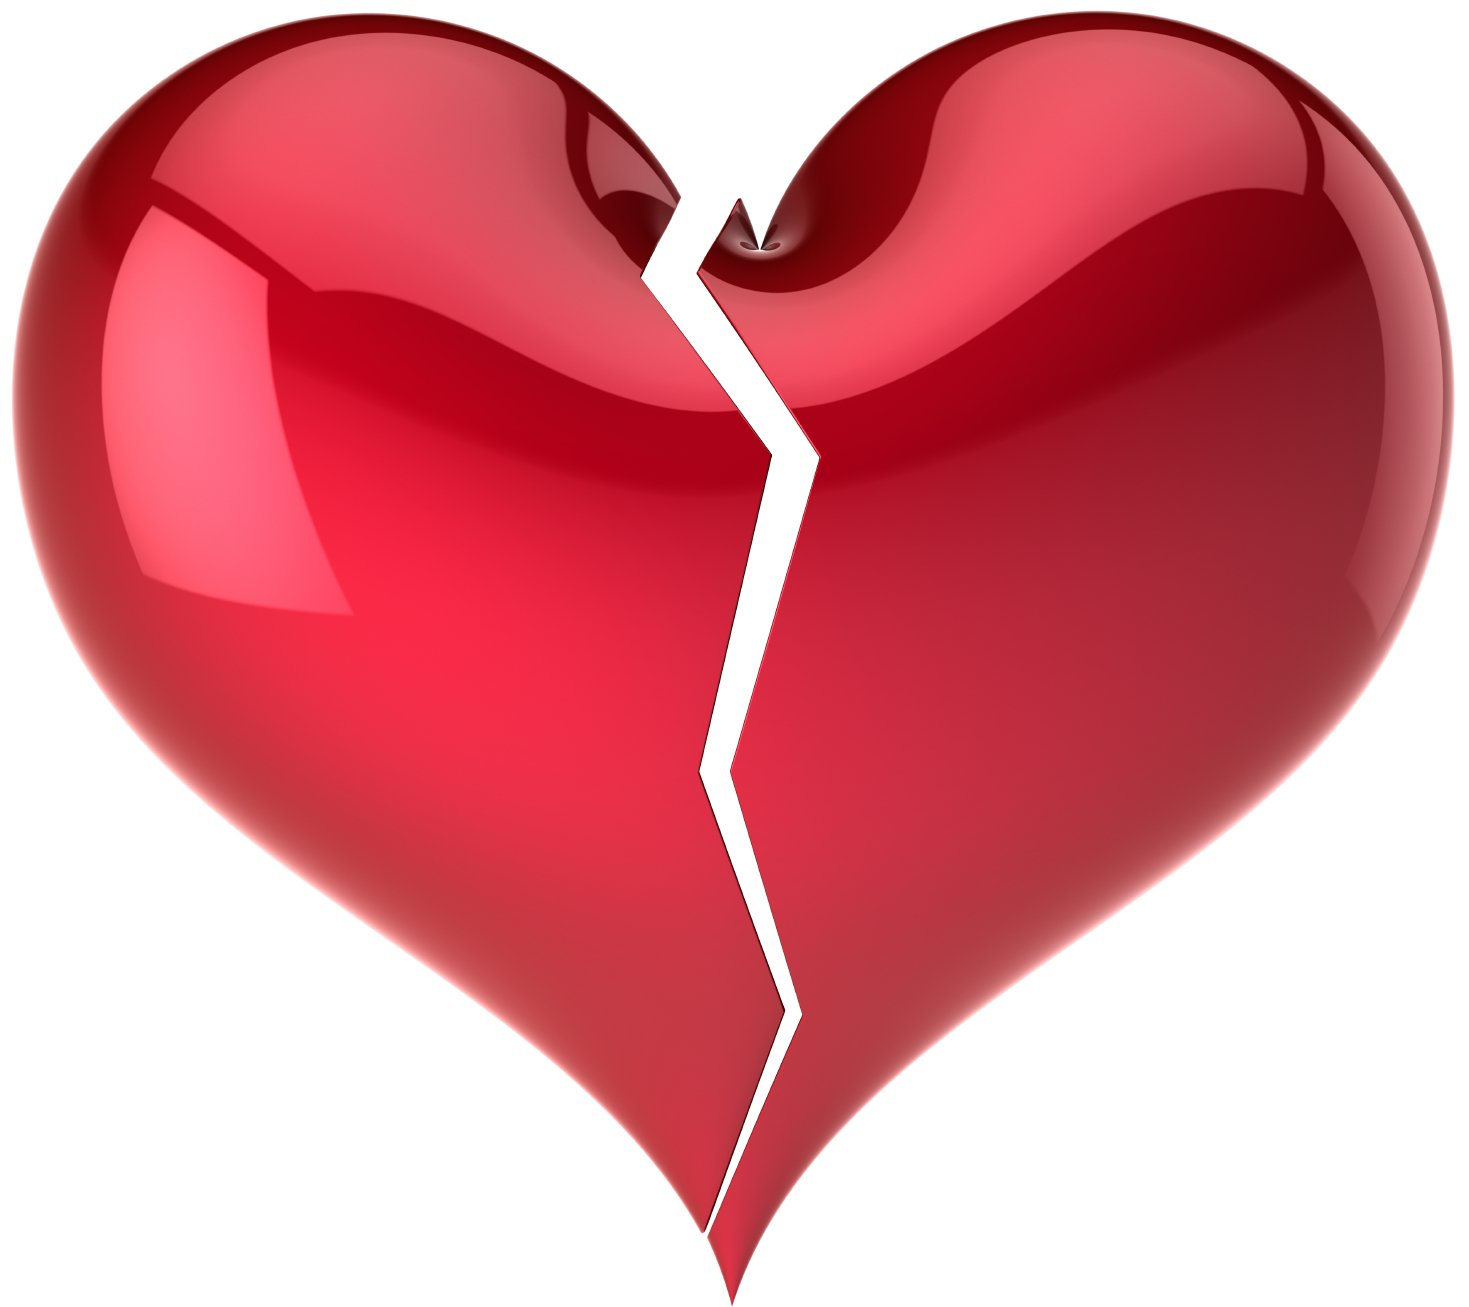 Break Them Up - Remove the Competition - Revenge Jealousy Love Separation Divorce